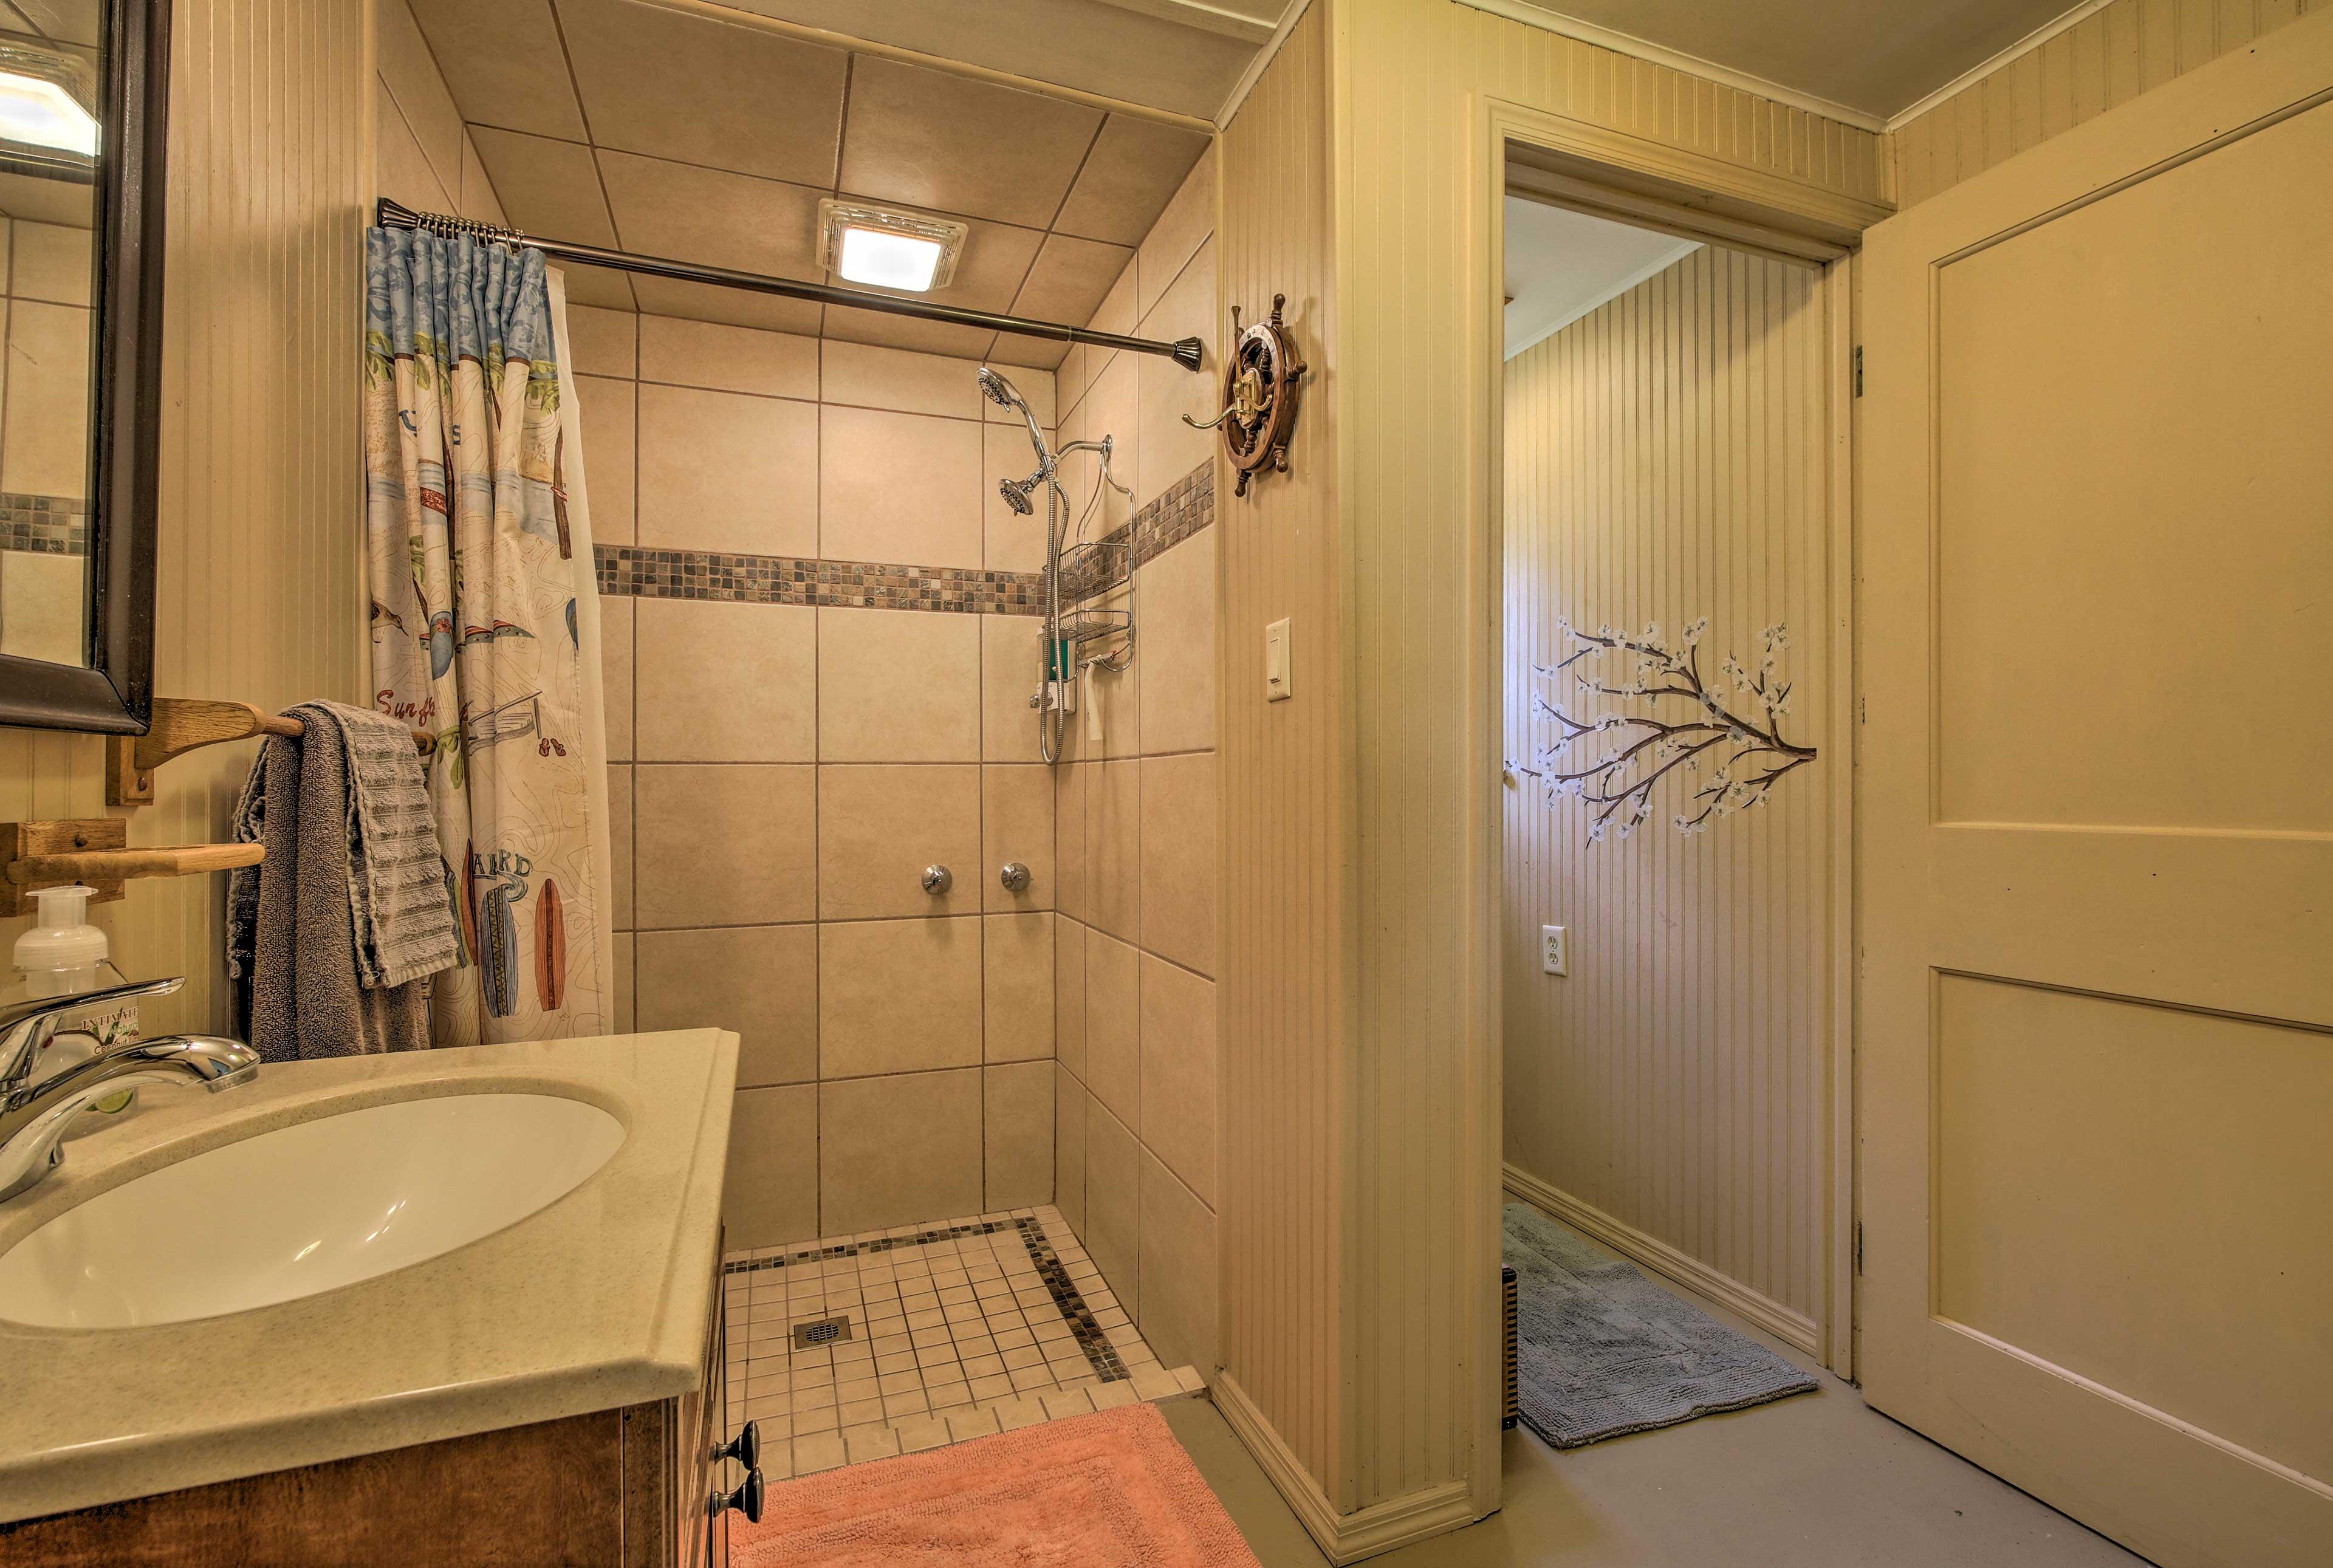 The full bathroom has a walk-in shower.